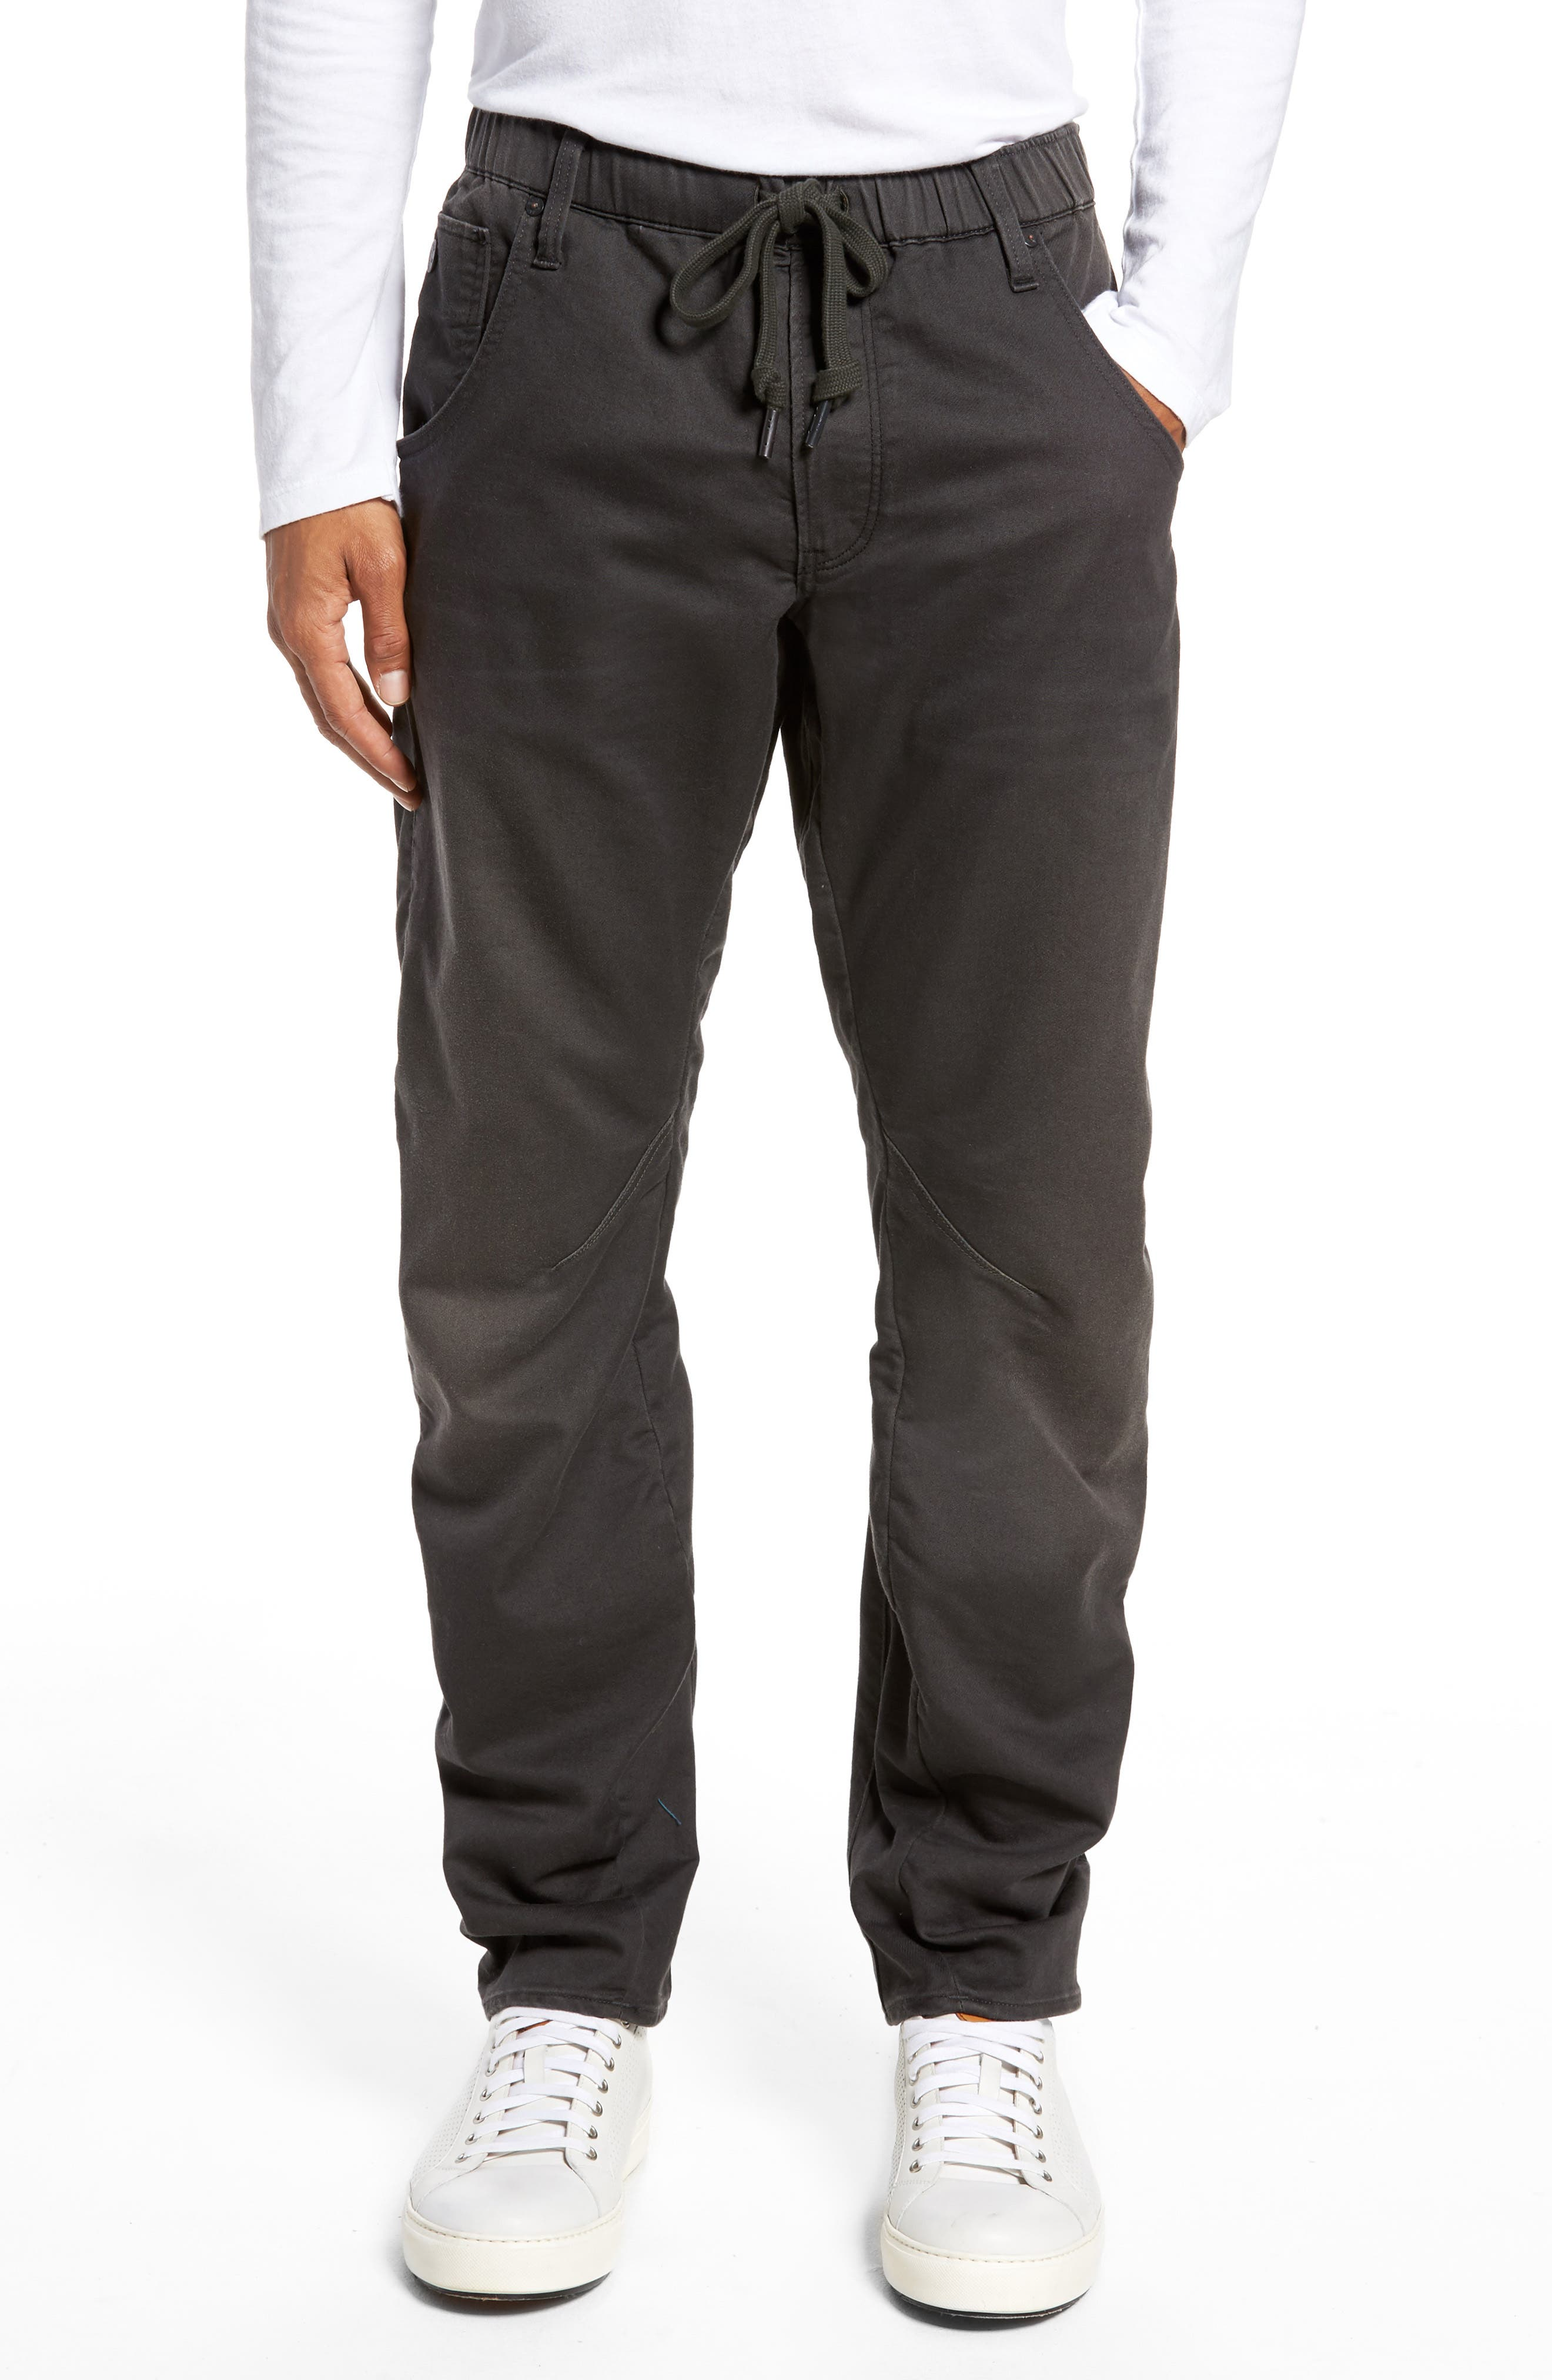 Arc 3D Sport Tapered Fit Jogger Pants,                             Main thumbnail 1, color,                             020